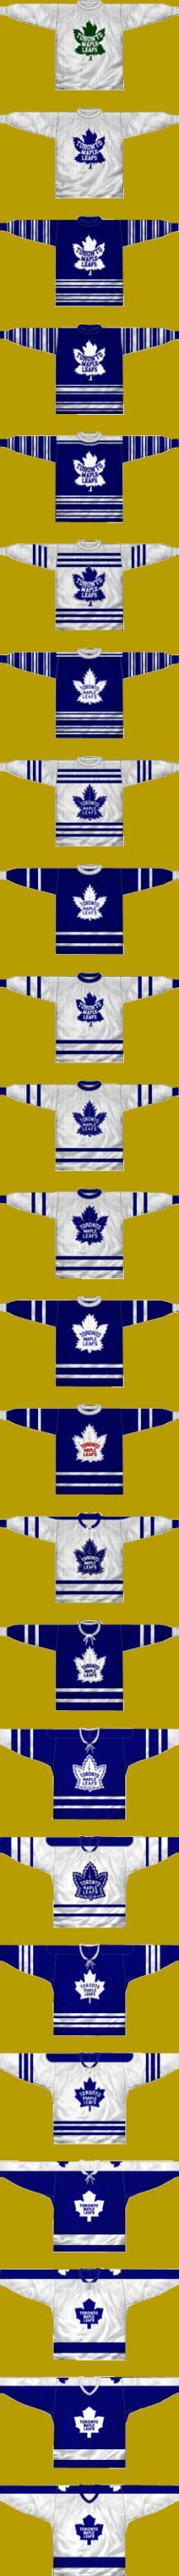 maple leaf hockey logo